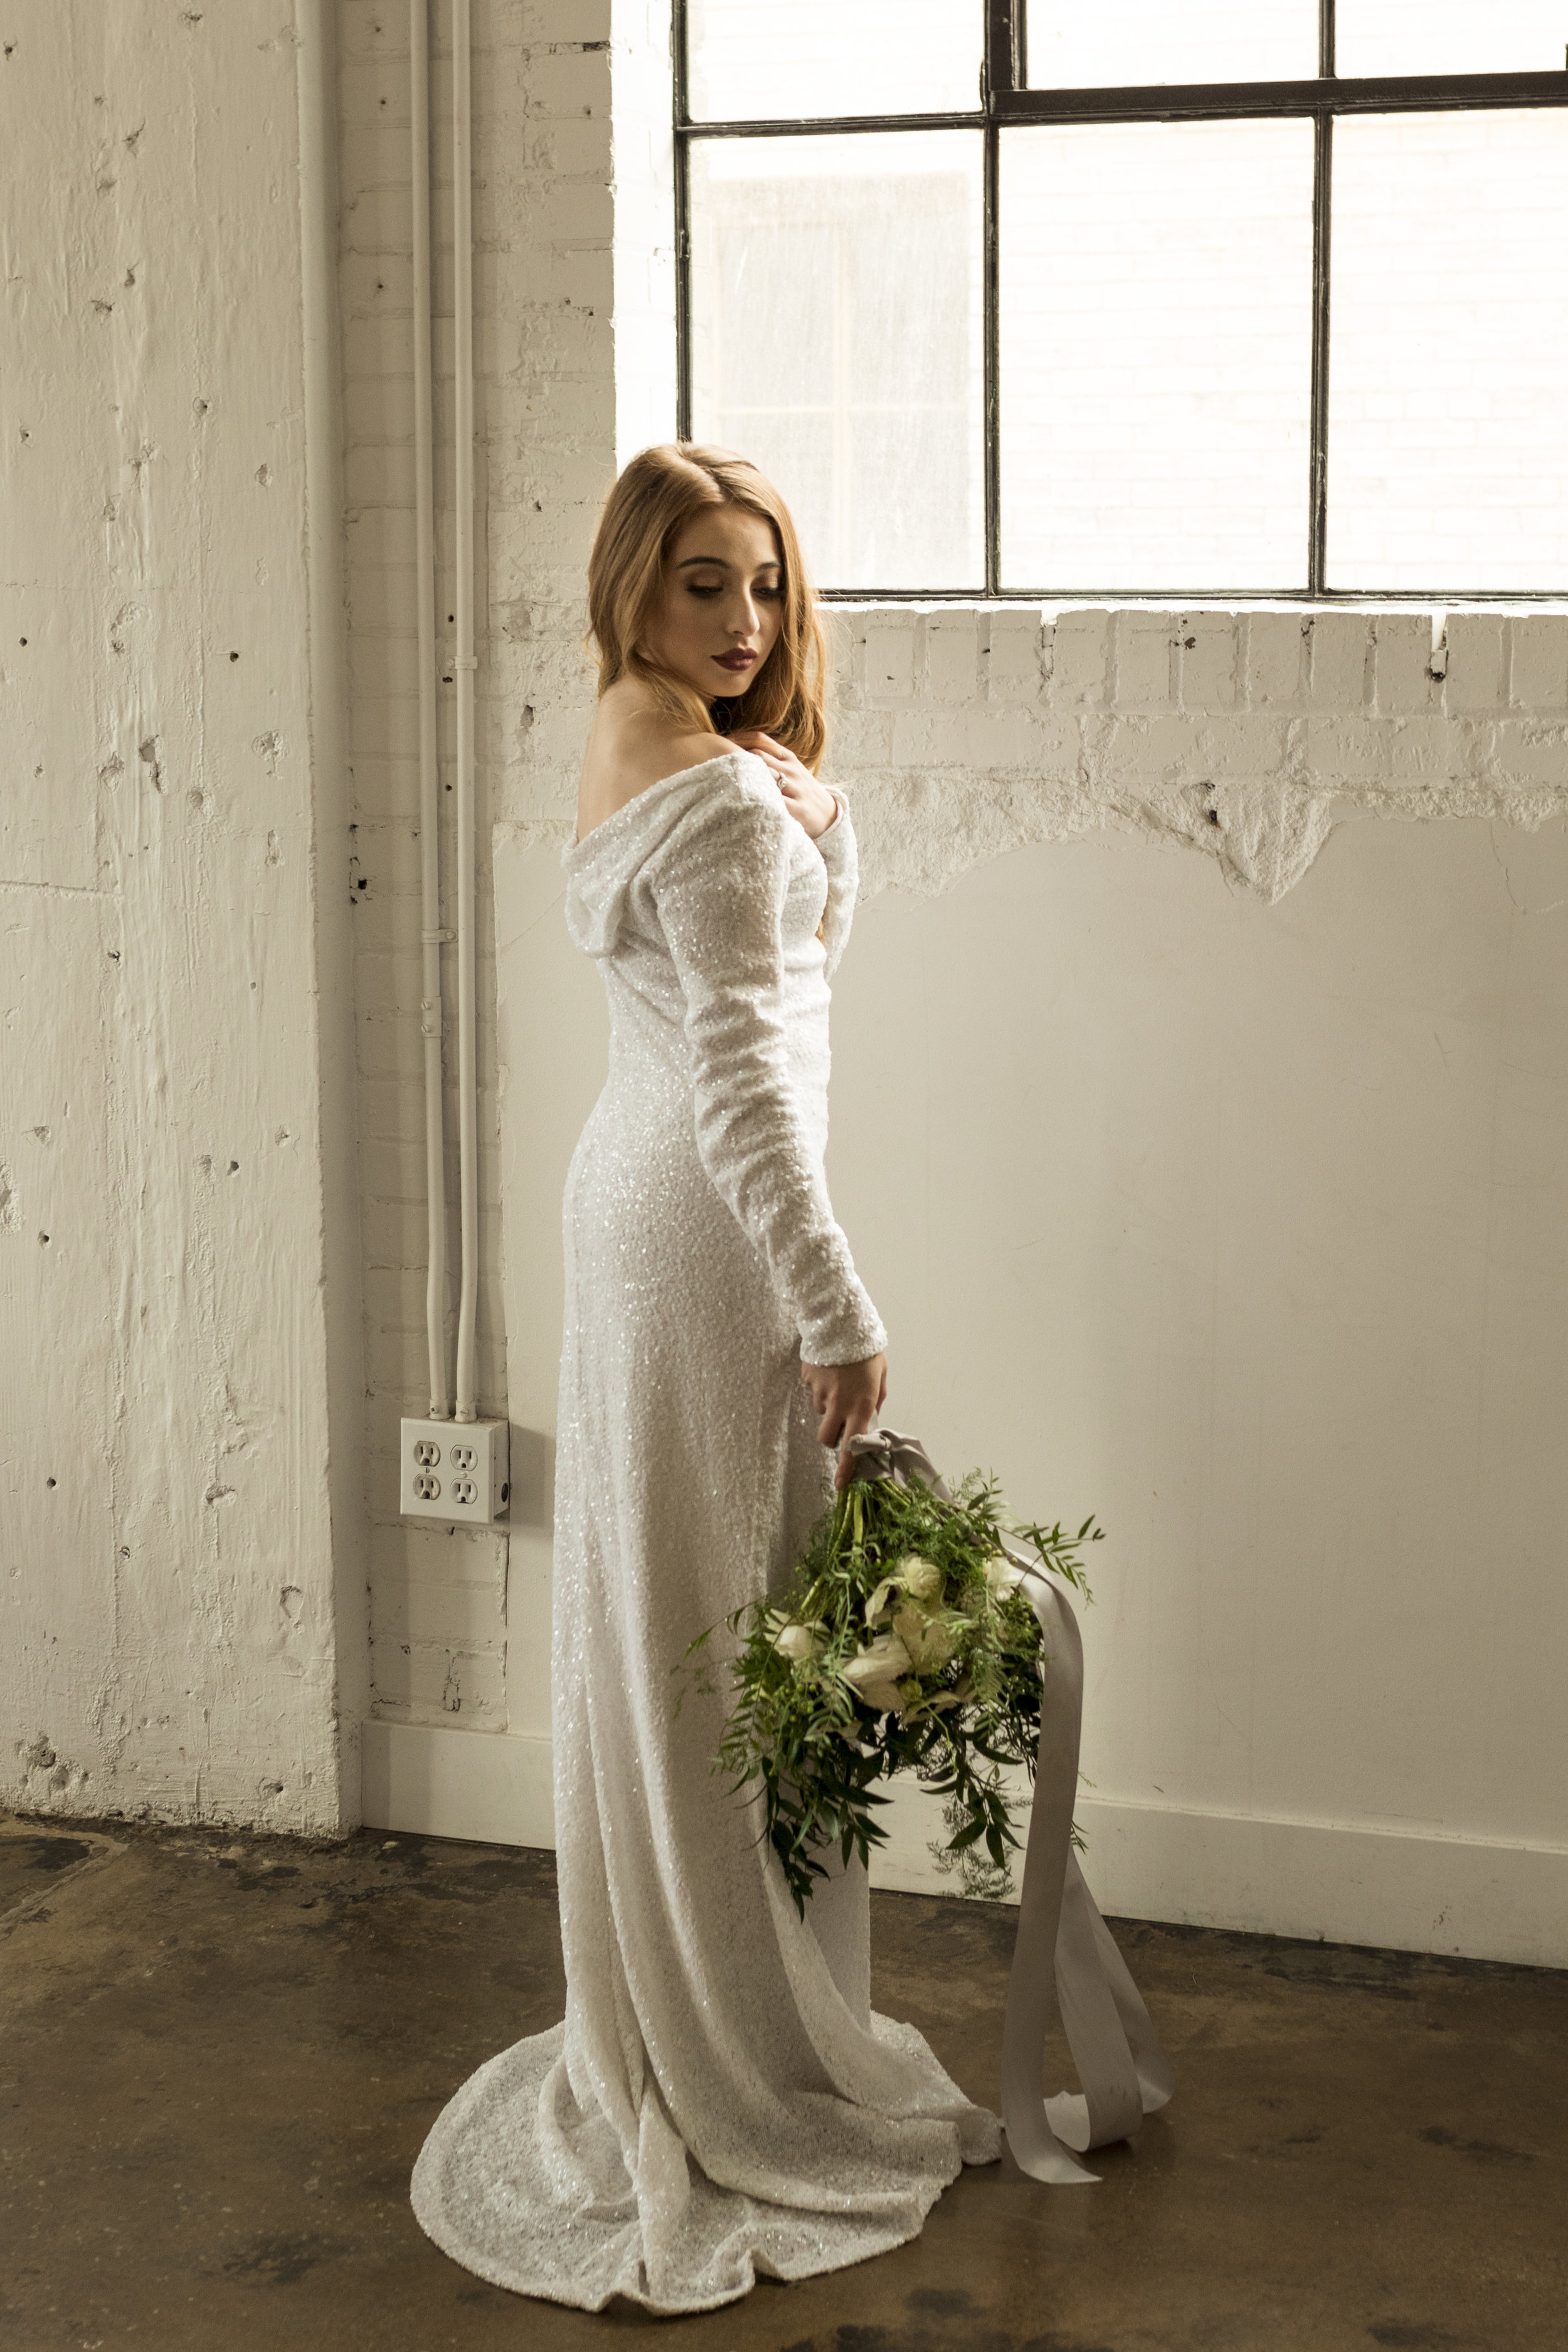 BBPhotodowntown Salt Lake CityUtah Wedding10.JPG